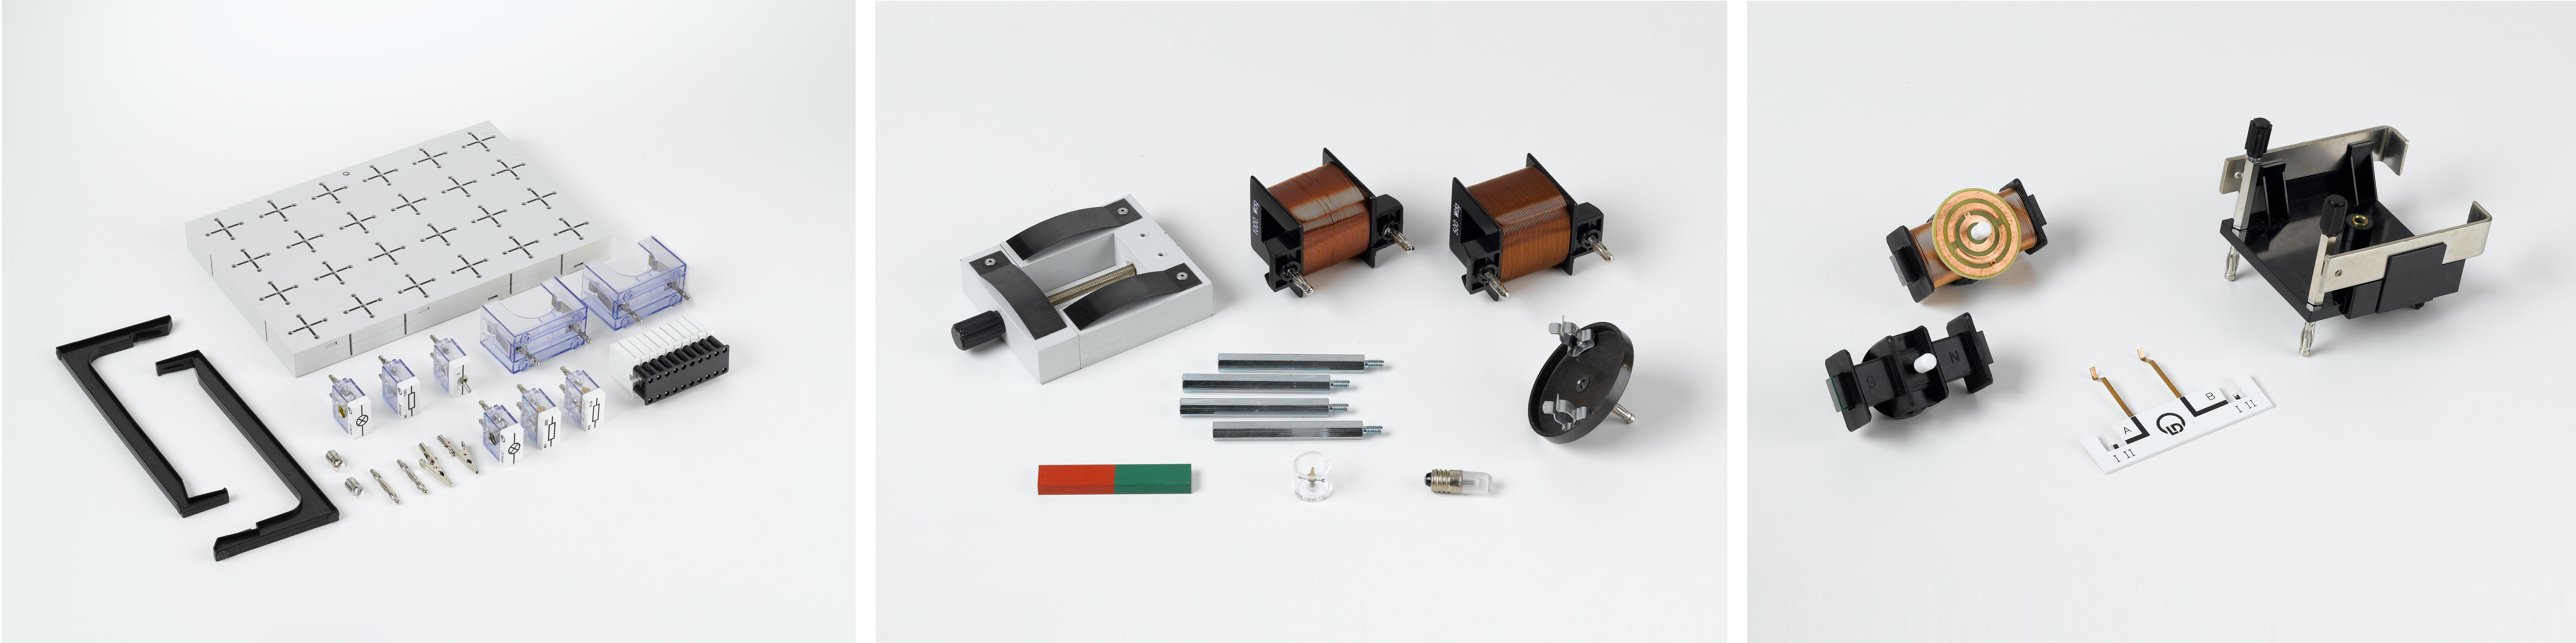 Basics of generators and motors